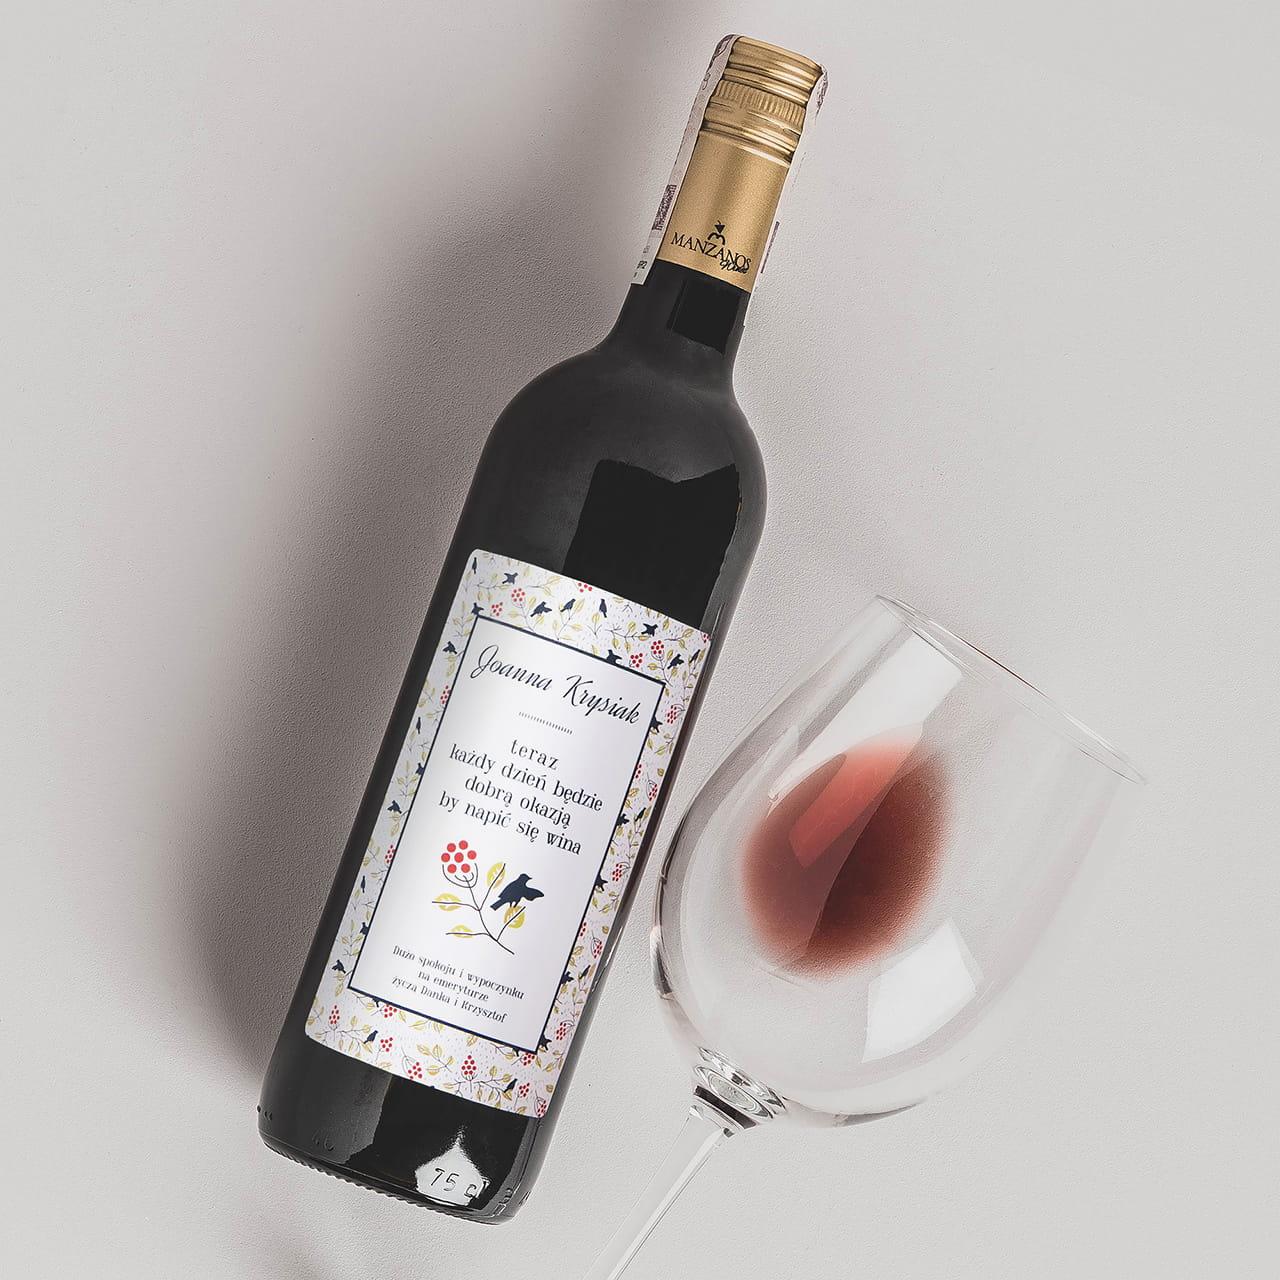 Wino to elegancki prezent dla emeryta